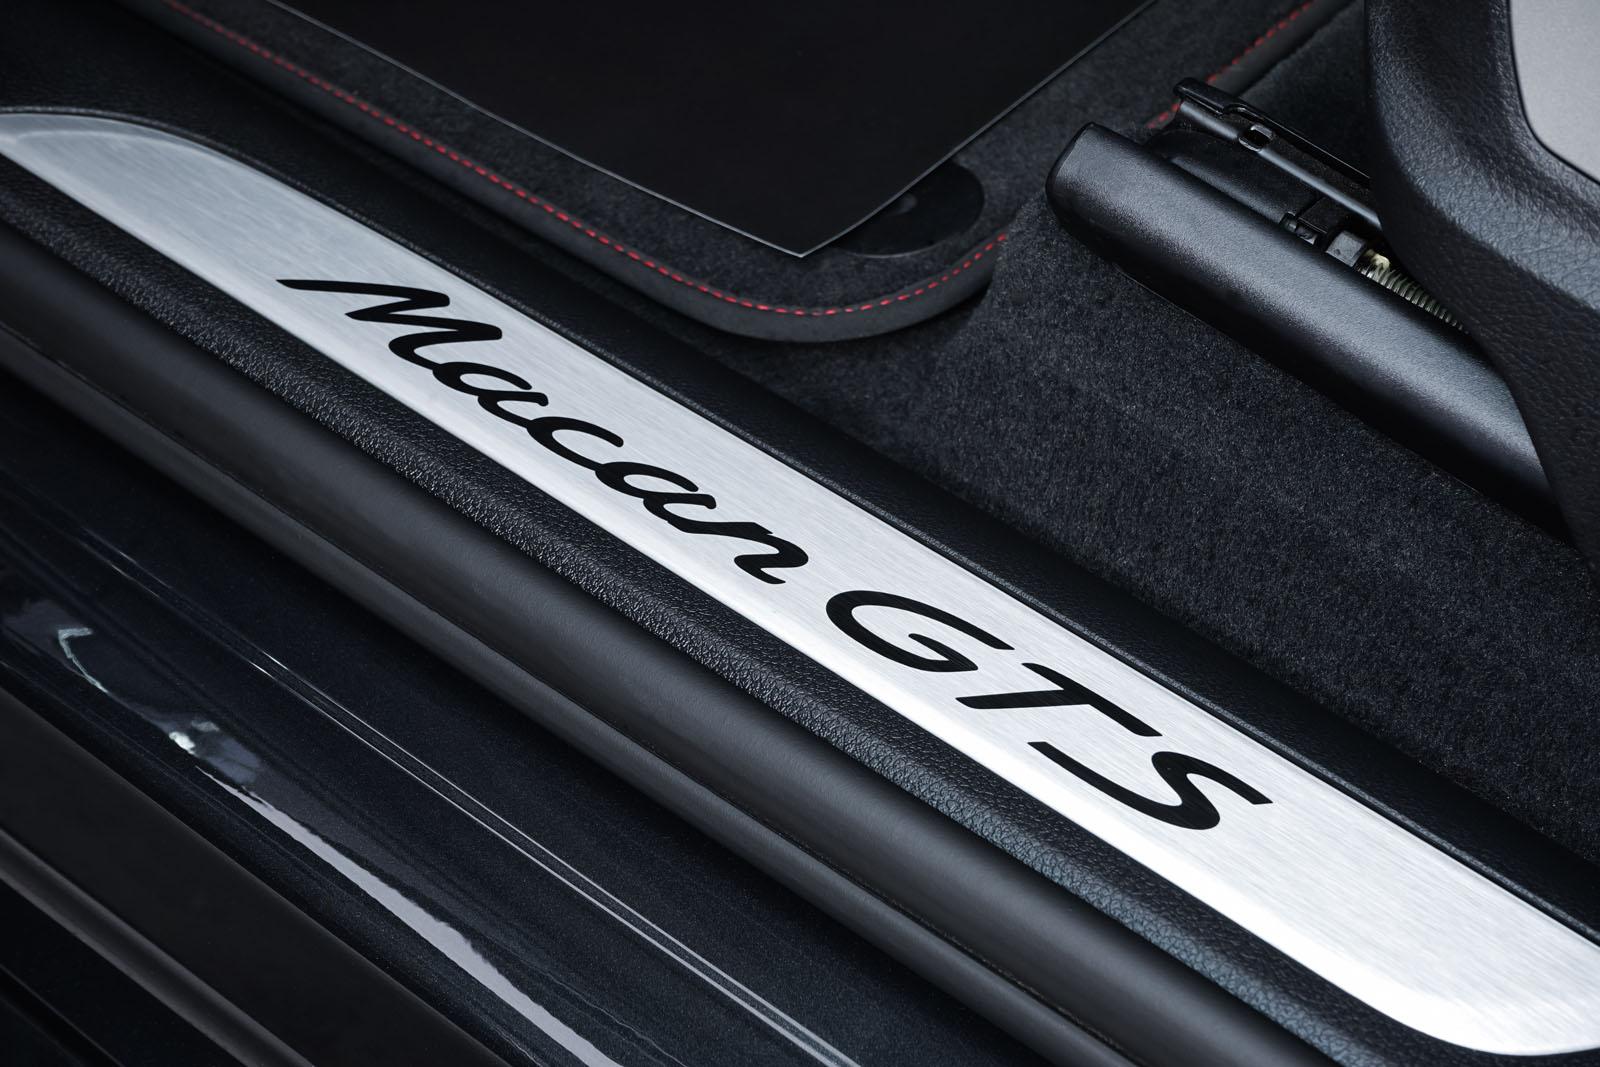 Porsche_Macan_GTS_Dunkelgrau_Schwarz_POR-8174_9_w